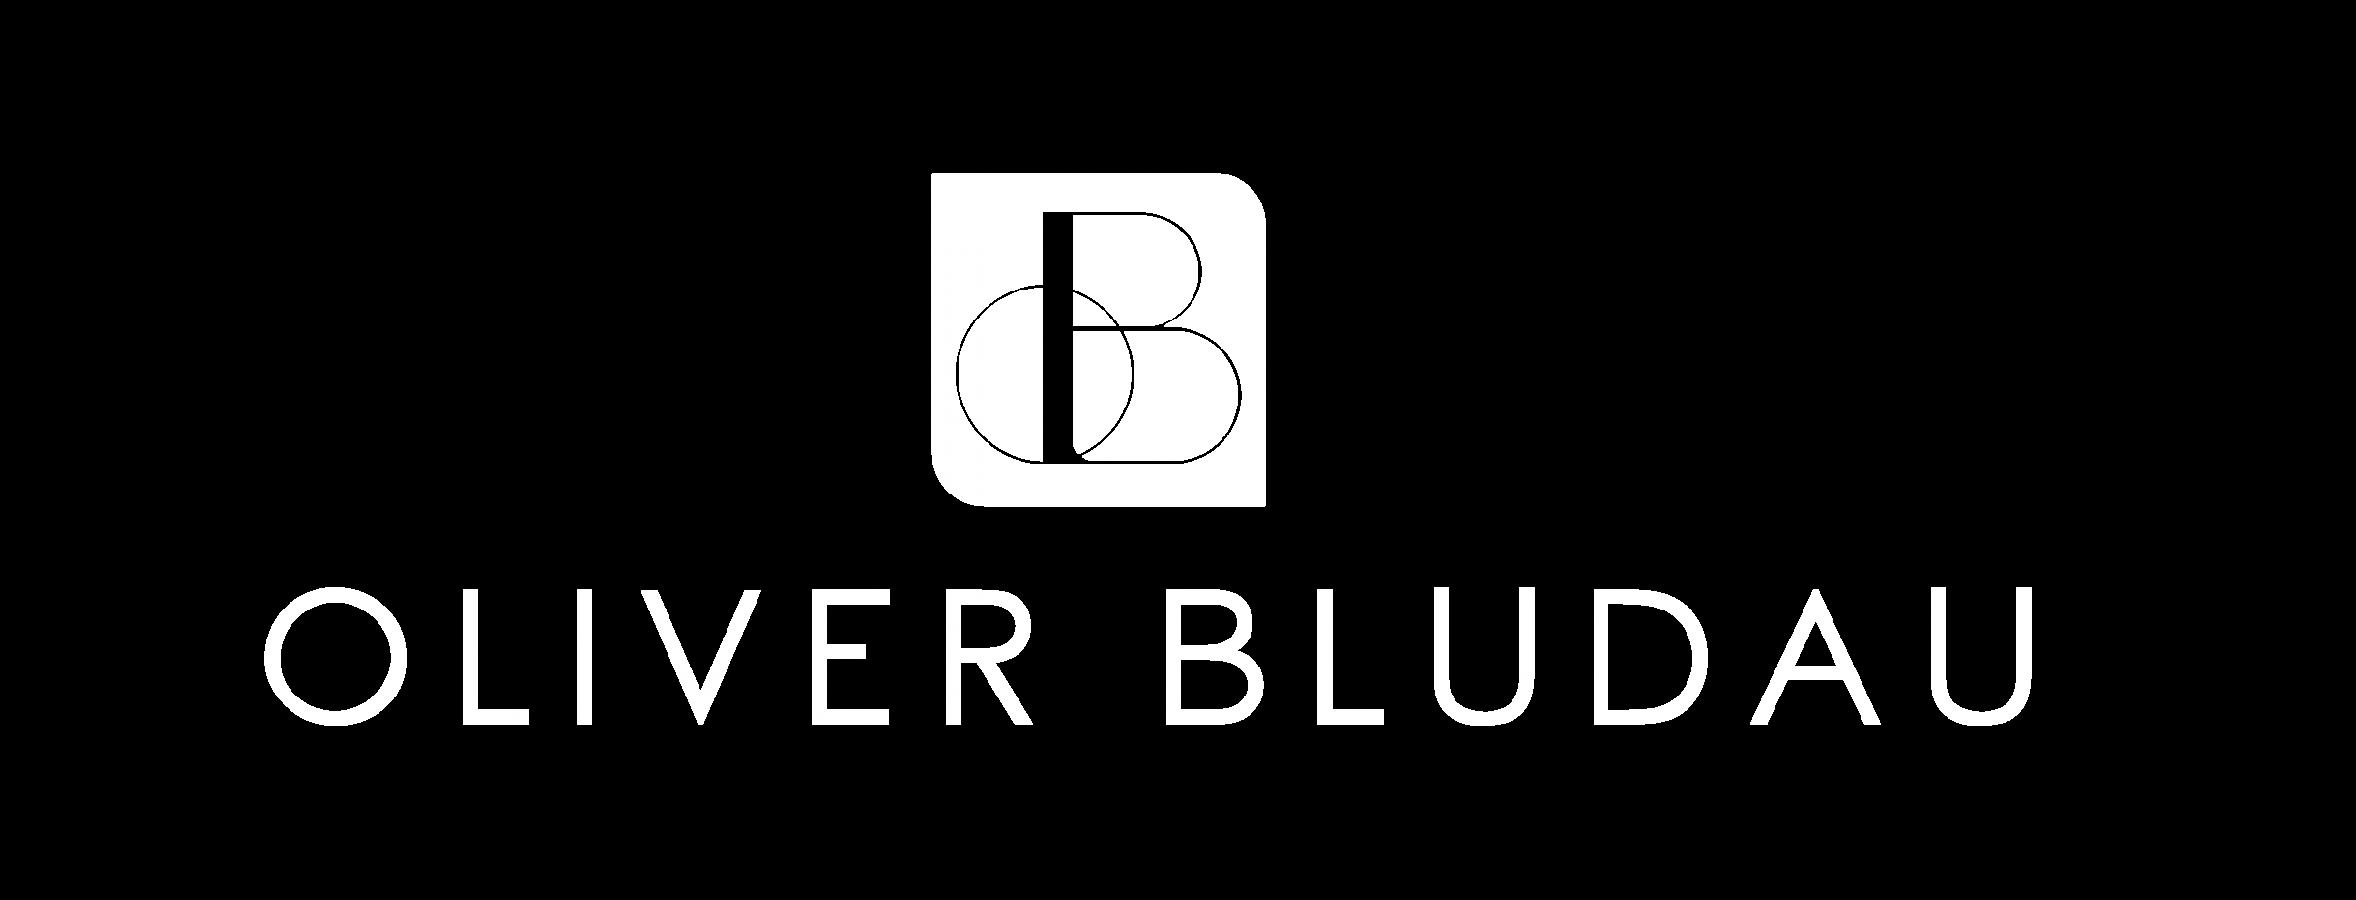 Ask Oliver Bludau